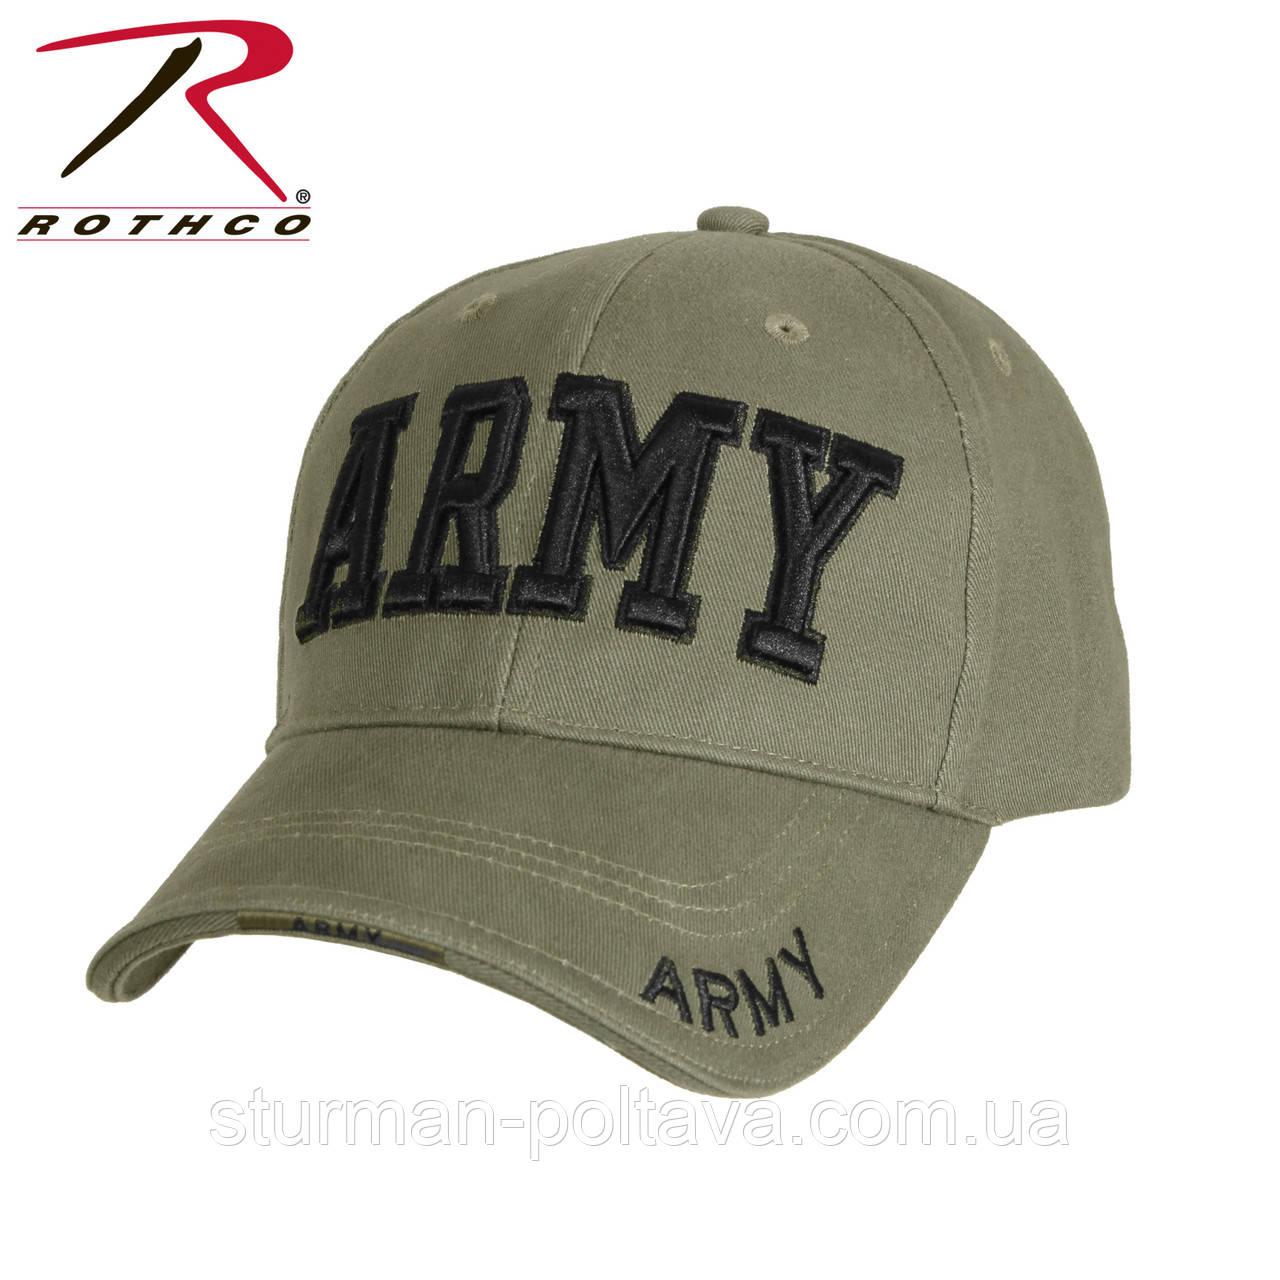 "Бейсболка чоловіча олива c вишивкою ""ARMY"" Rotcho USA"